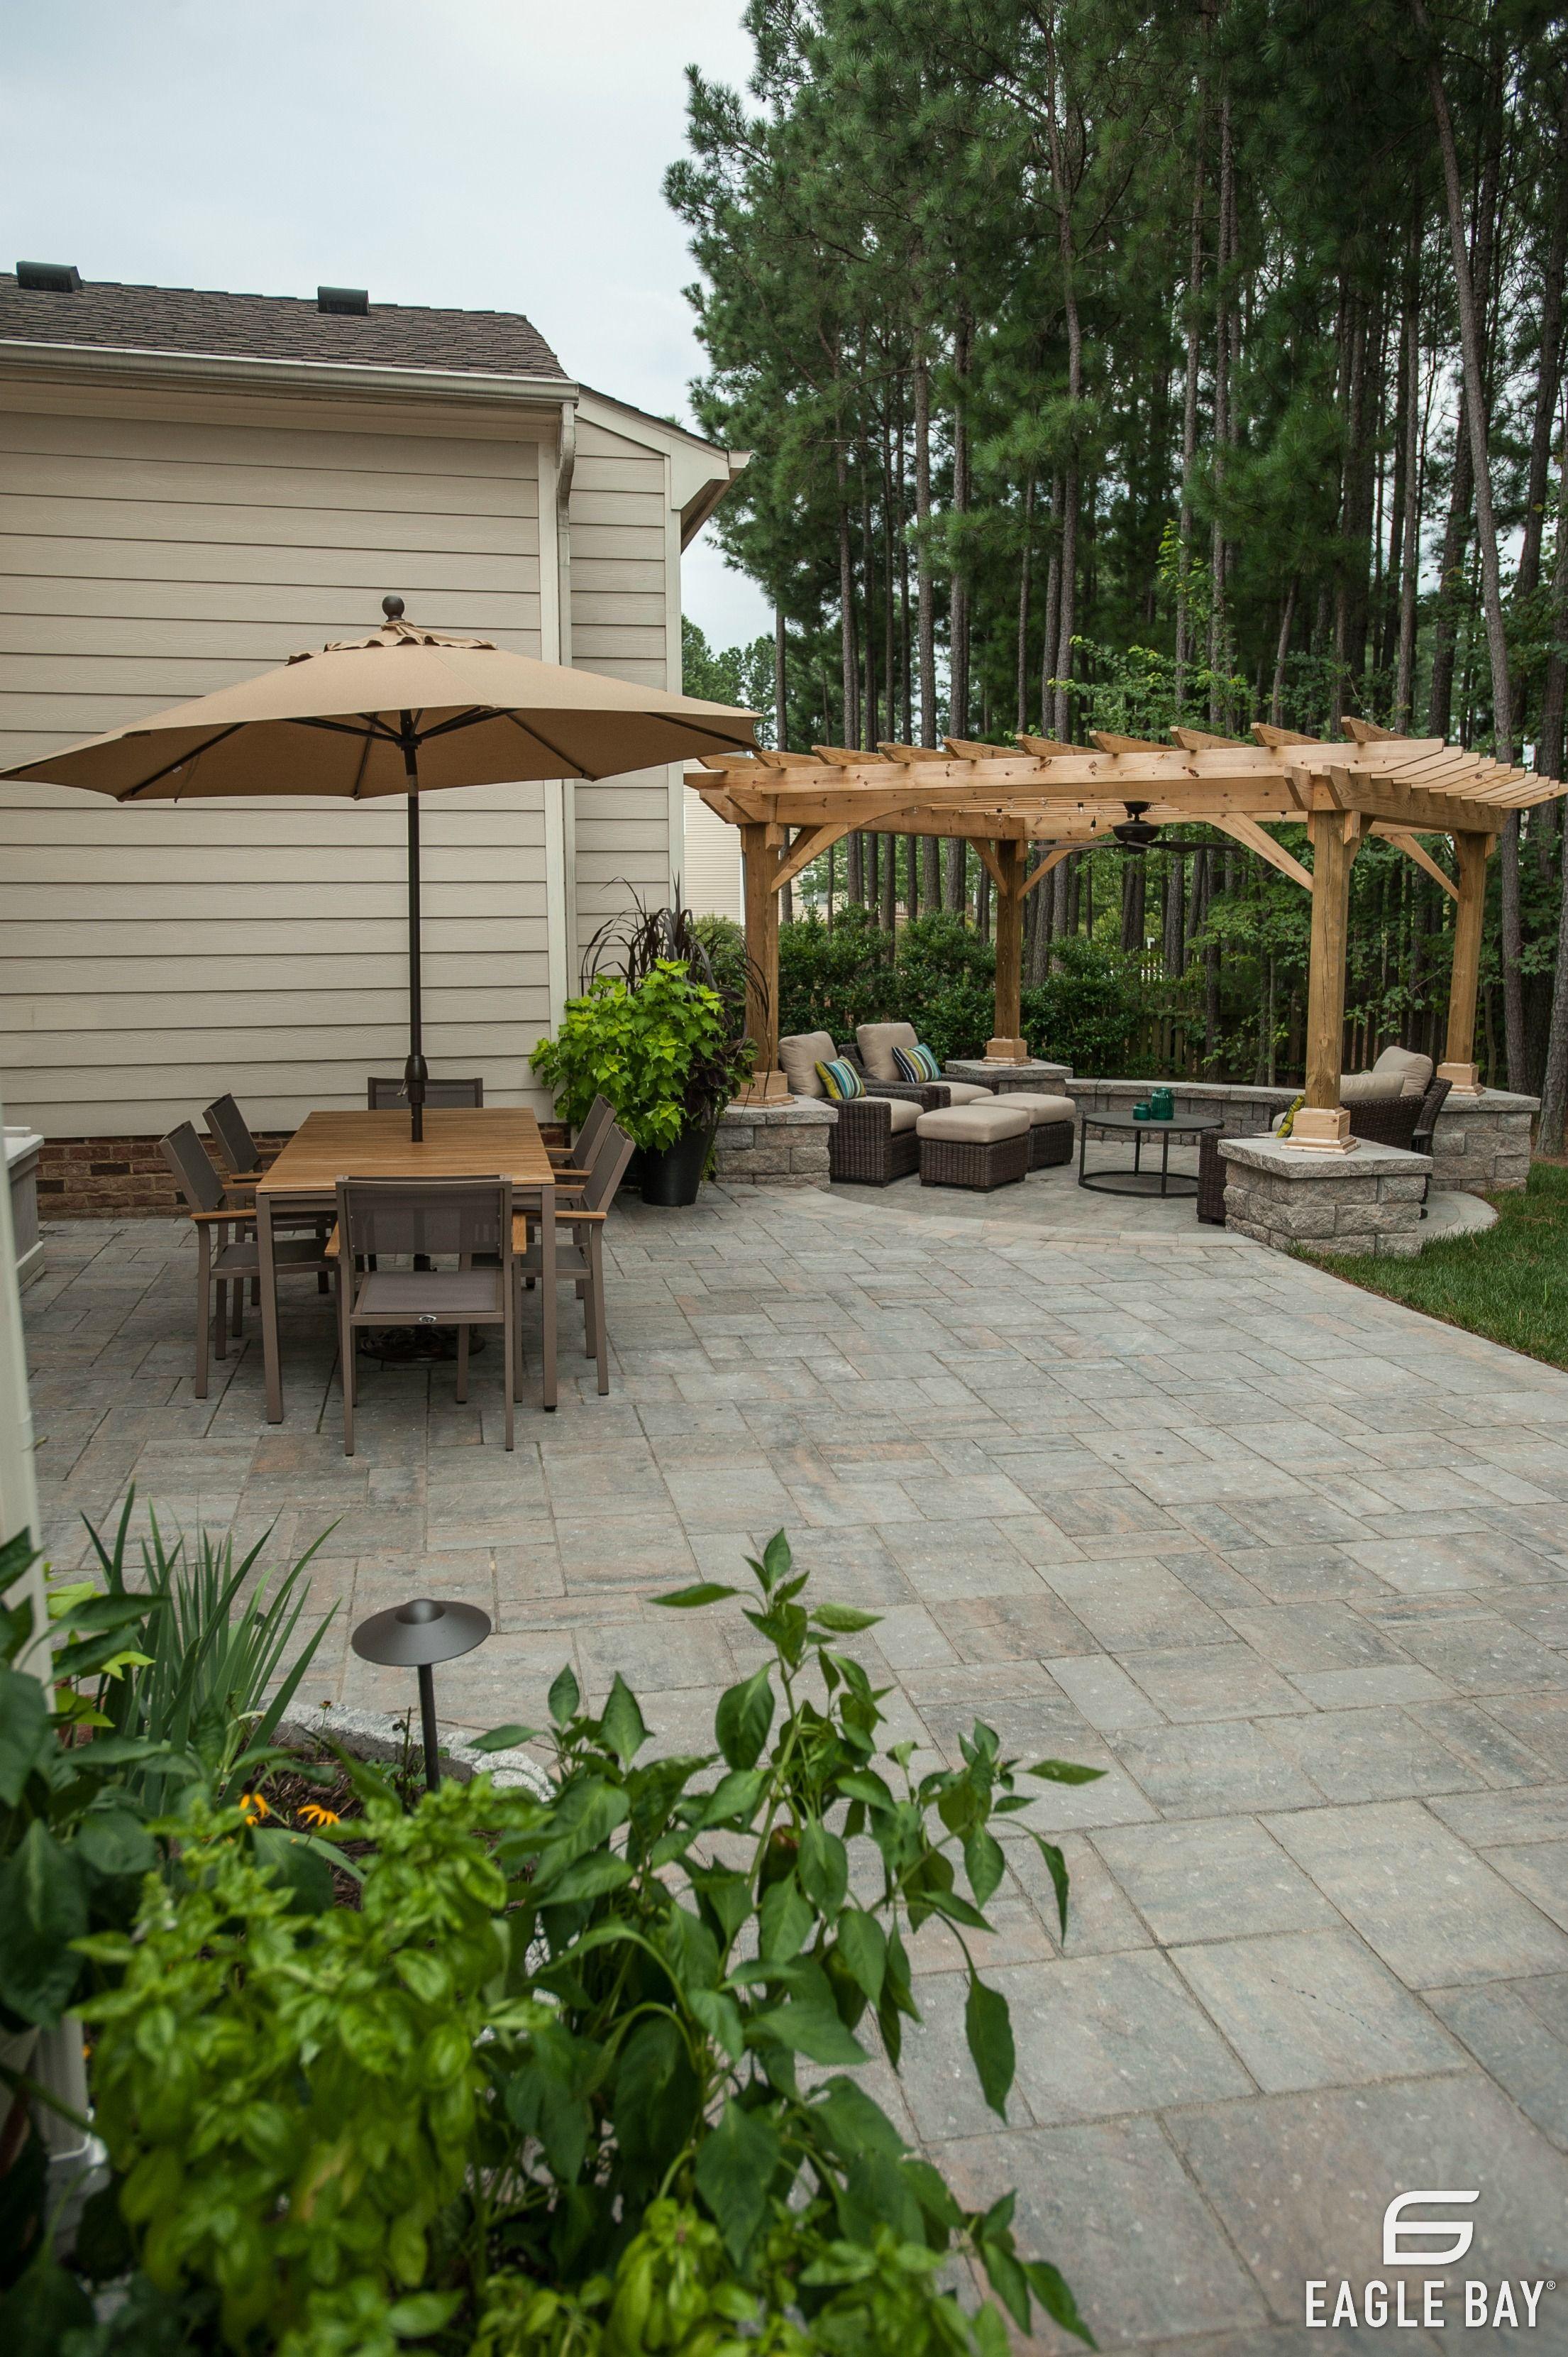 Pergolas Your patio will thank you 😊